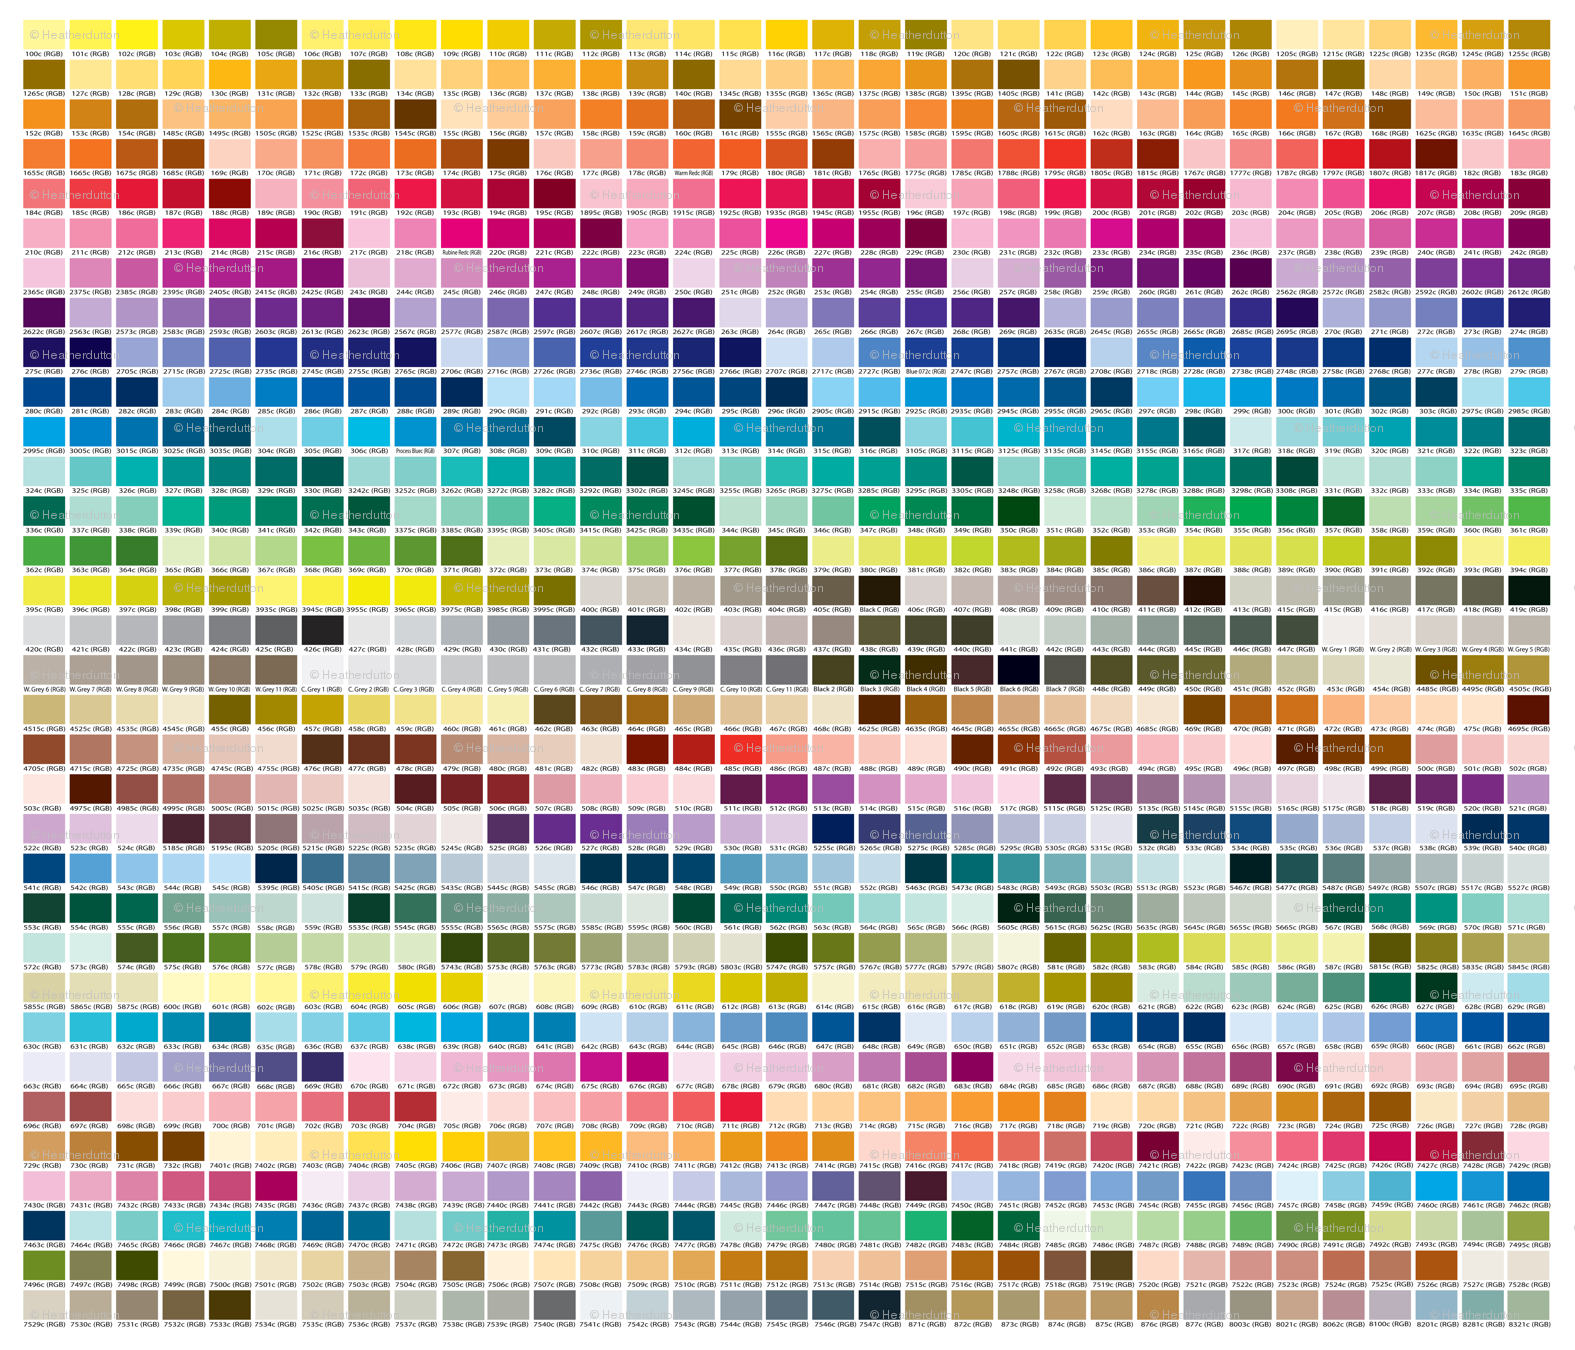 Image Result For Pantone Color Chart Hessler Printing